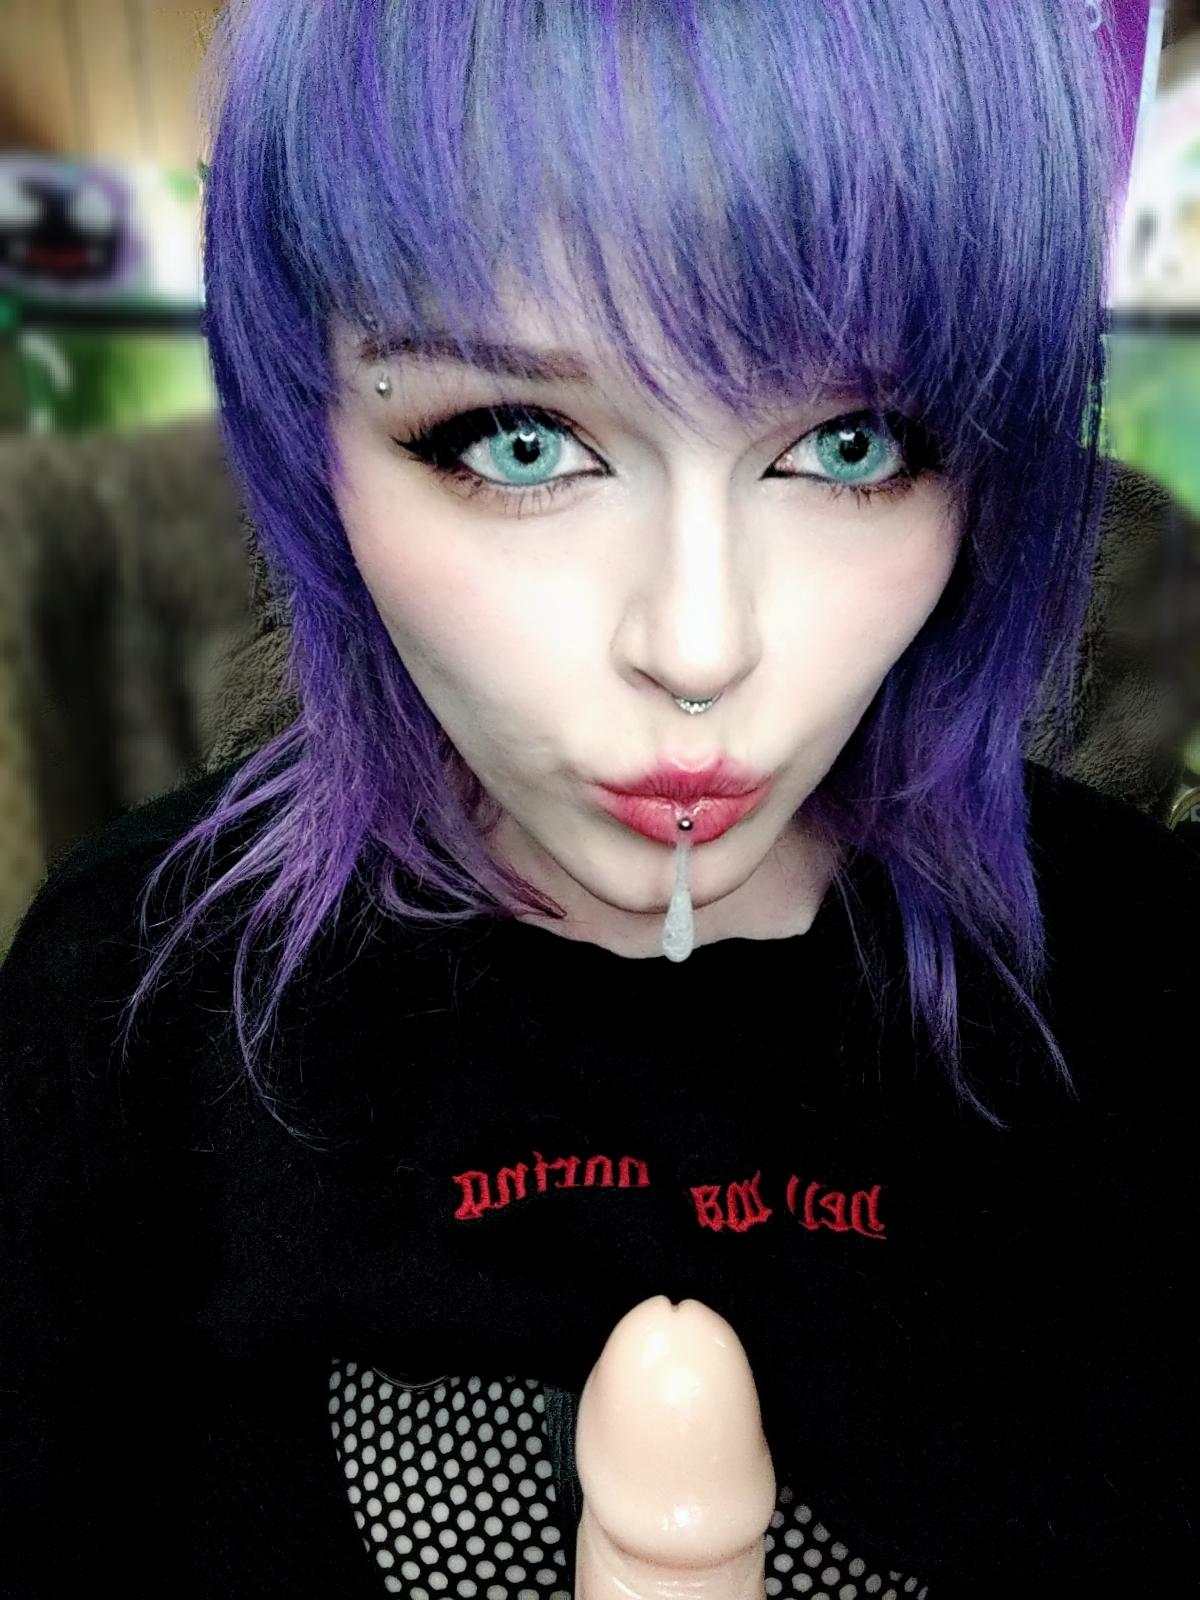 Poofychan's Slutty Goth E Girl Cosplay 0004